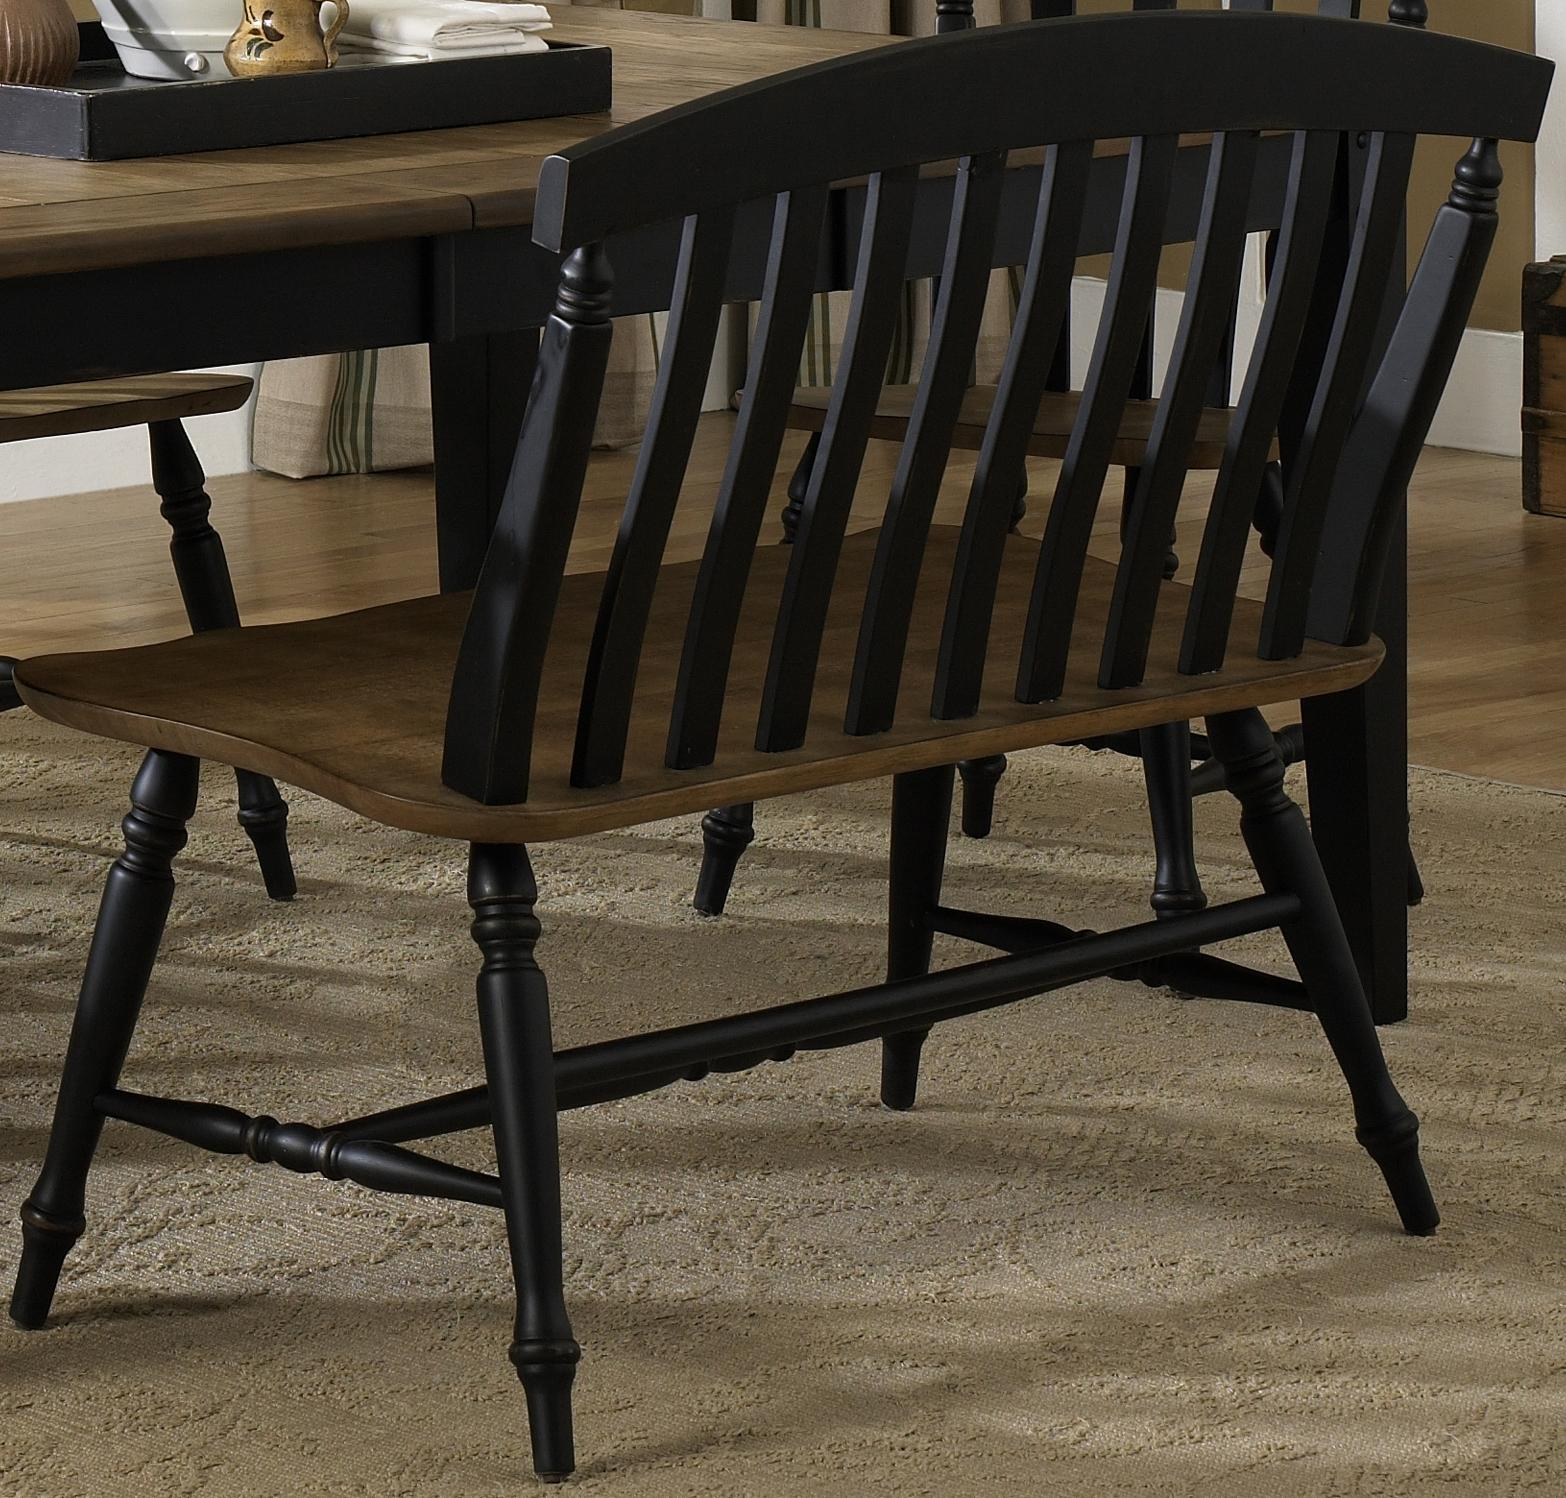 al s chairs and tables swivel chair grey liberty furniture fresco ii 641 c9000b two tone slat